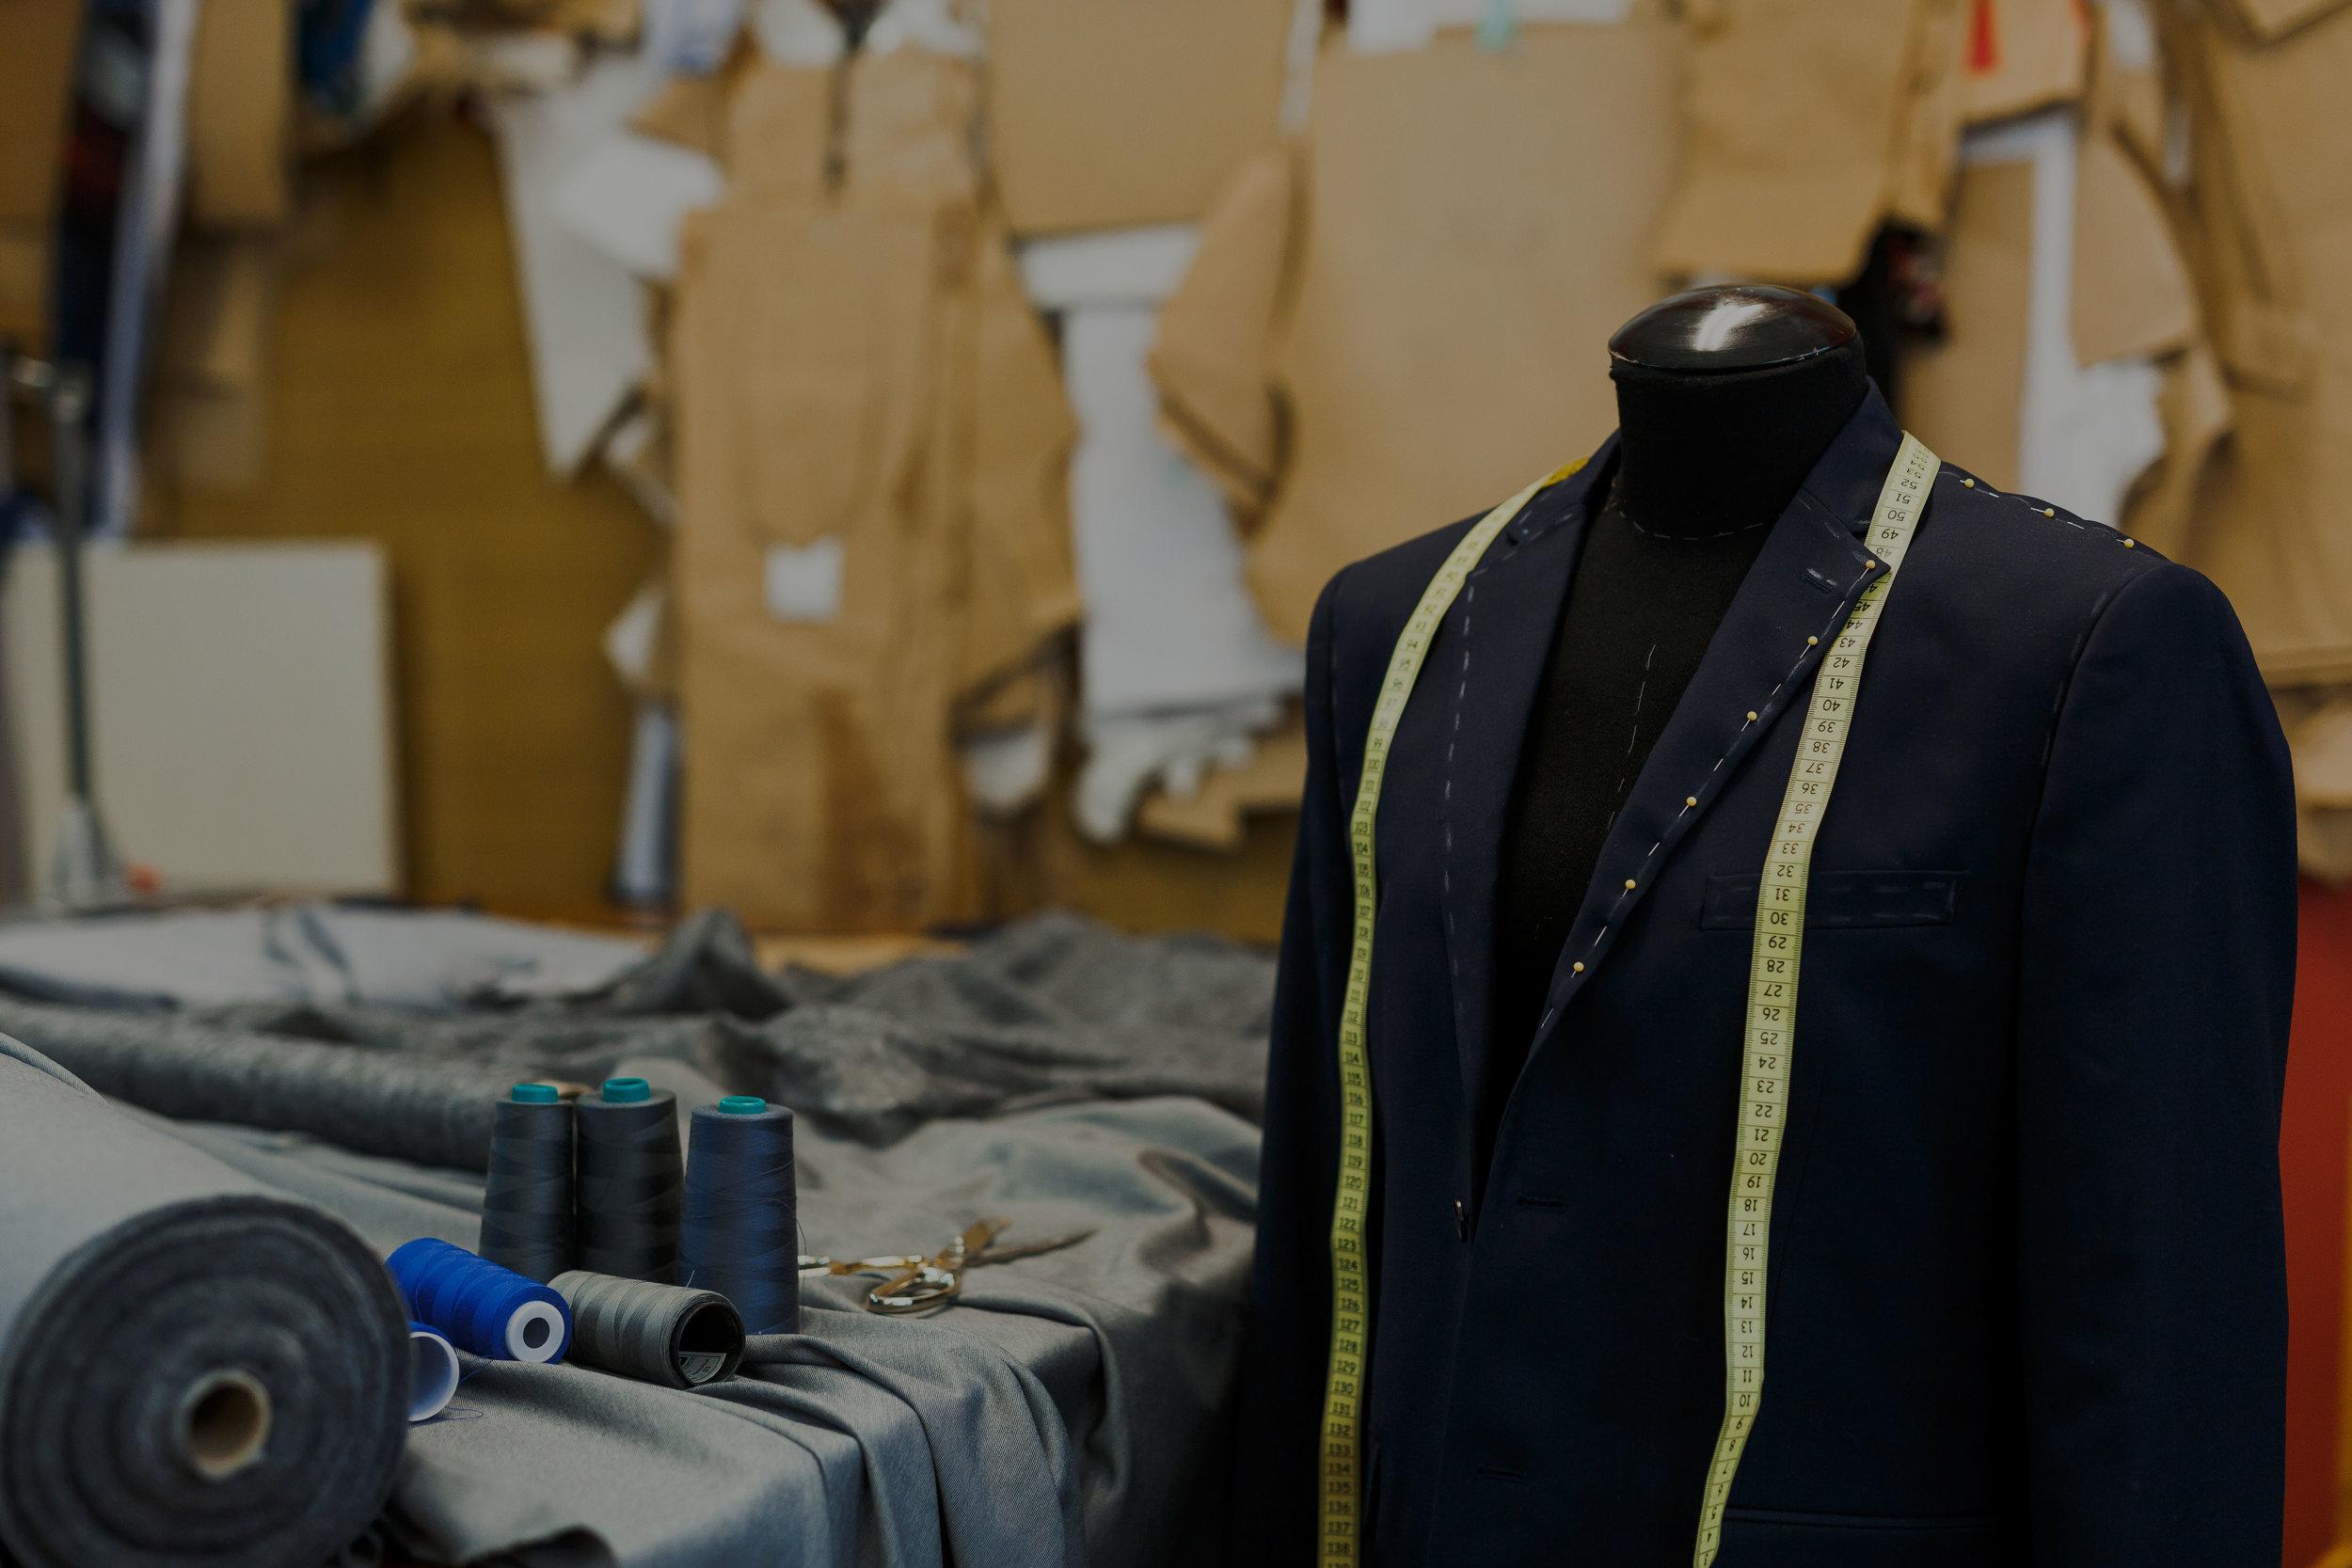 tailoring-studio-PYPW45B copy.jpg